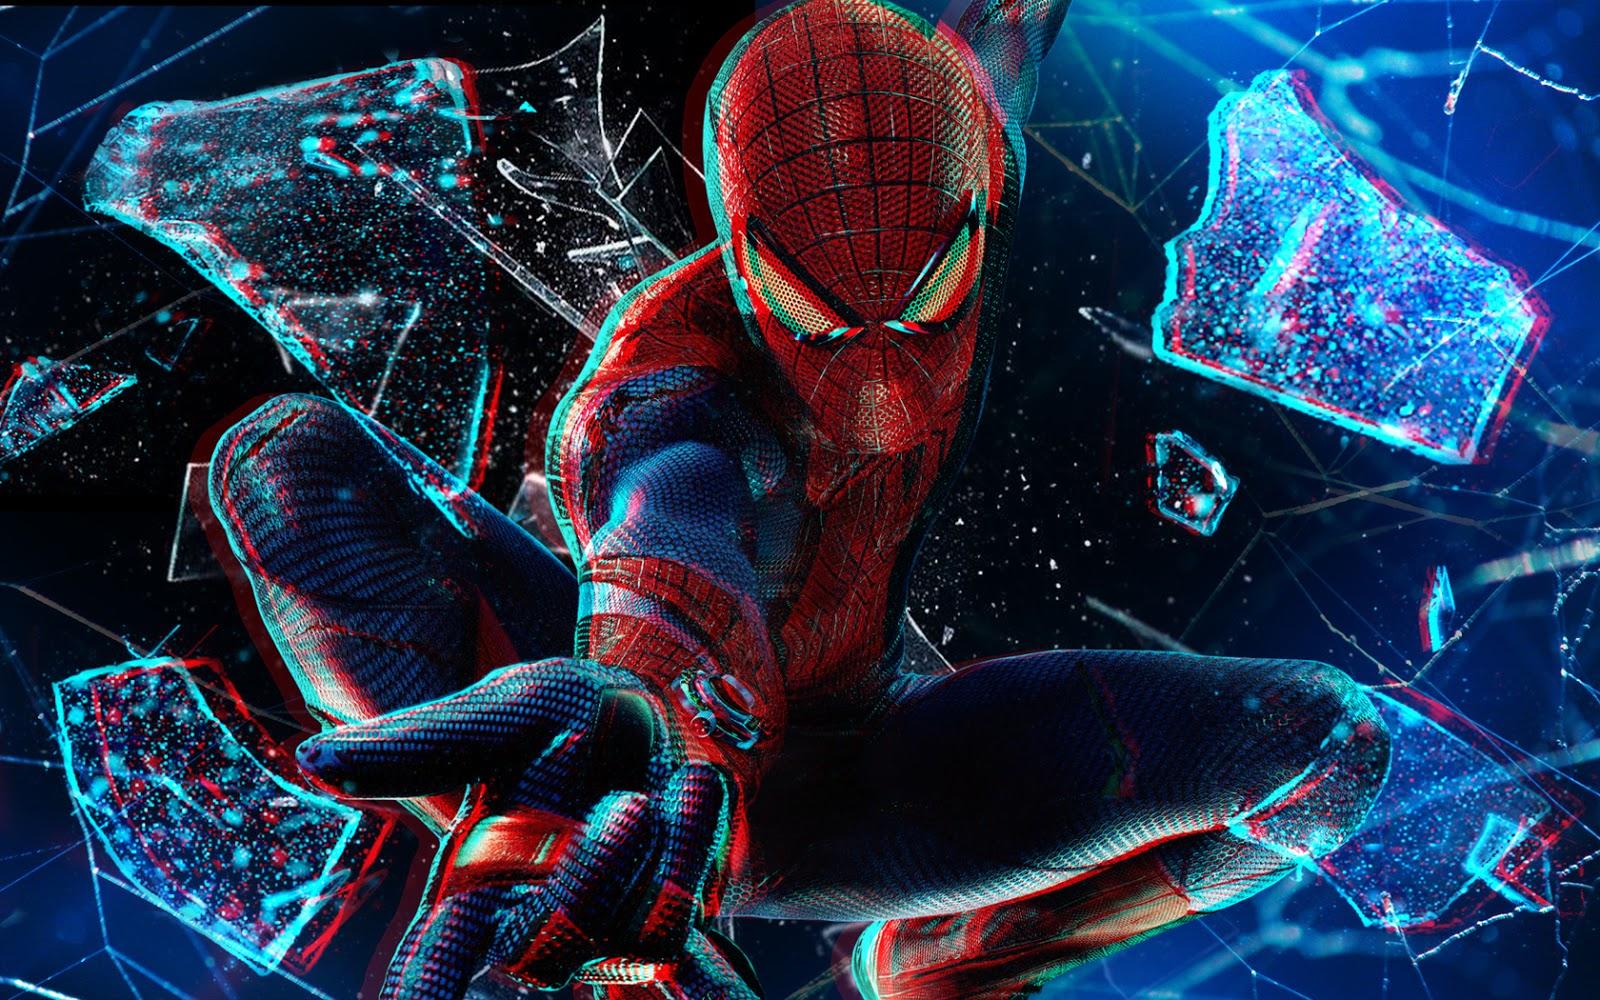 Awesome HD Wallpapers 1080p WallpaperSafari